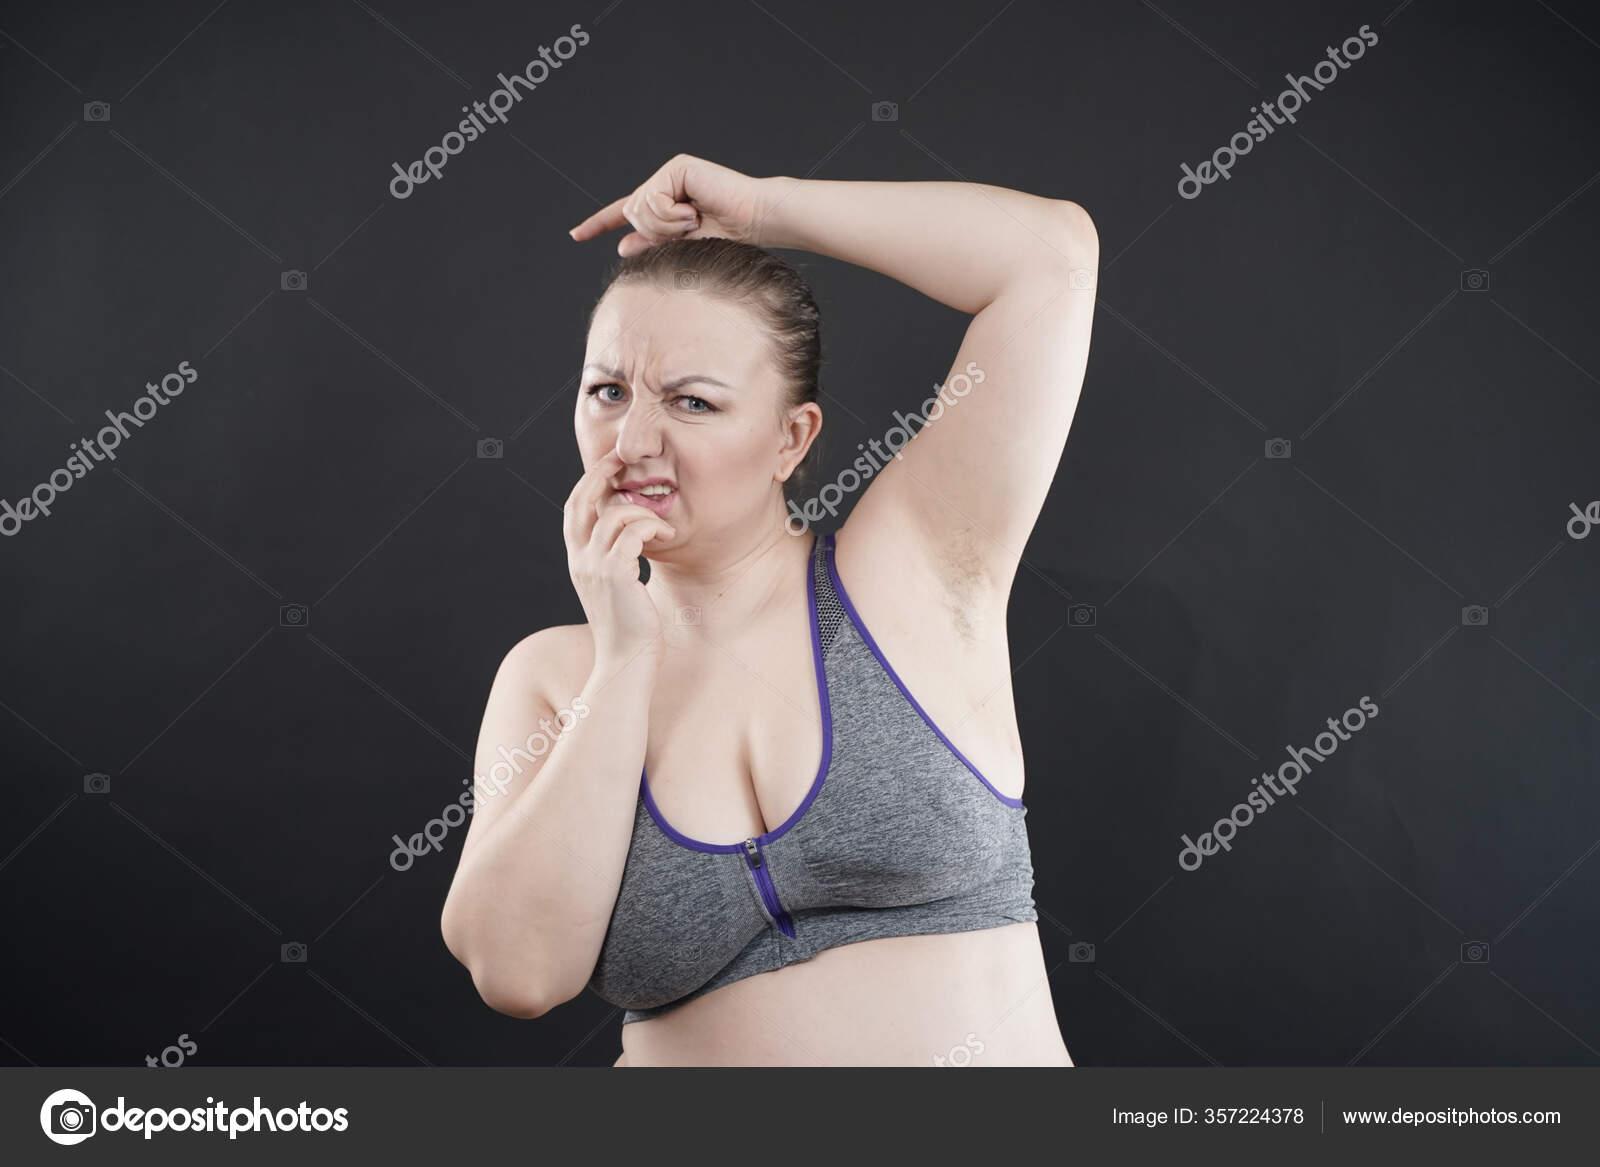 Unrasierte Frau